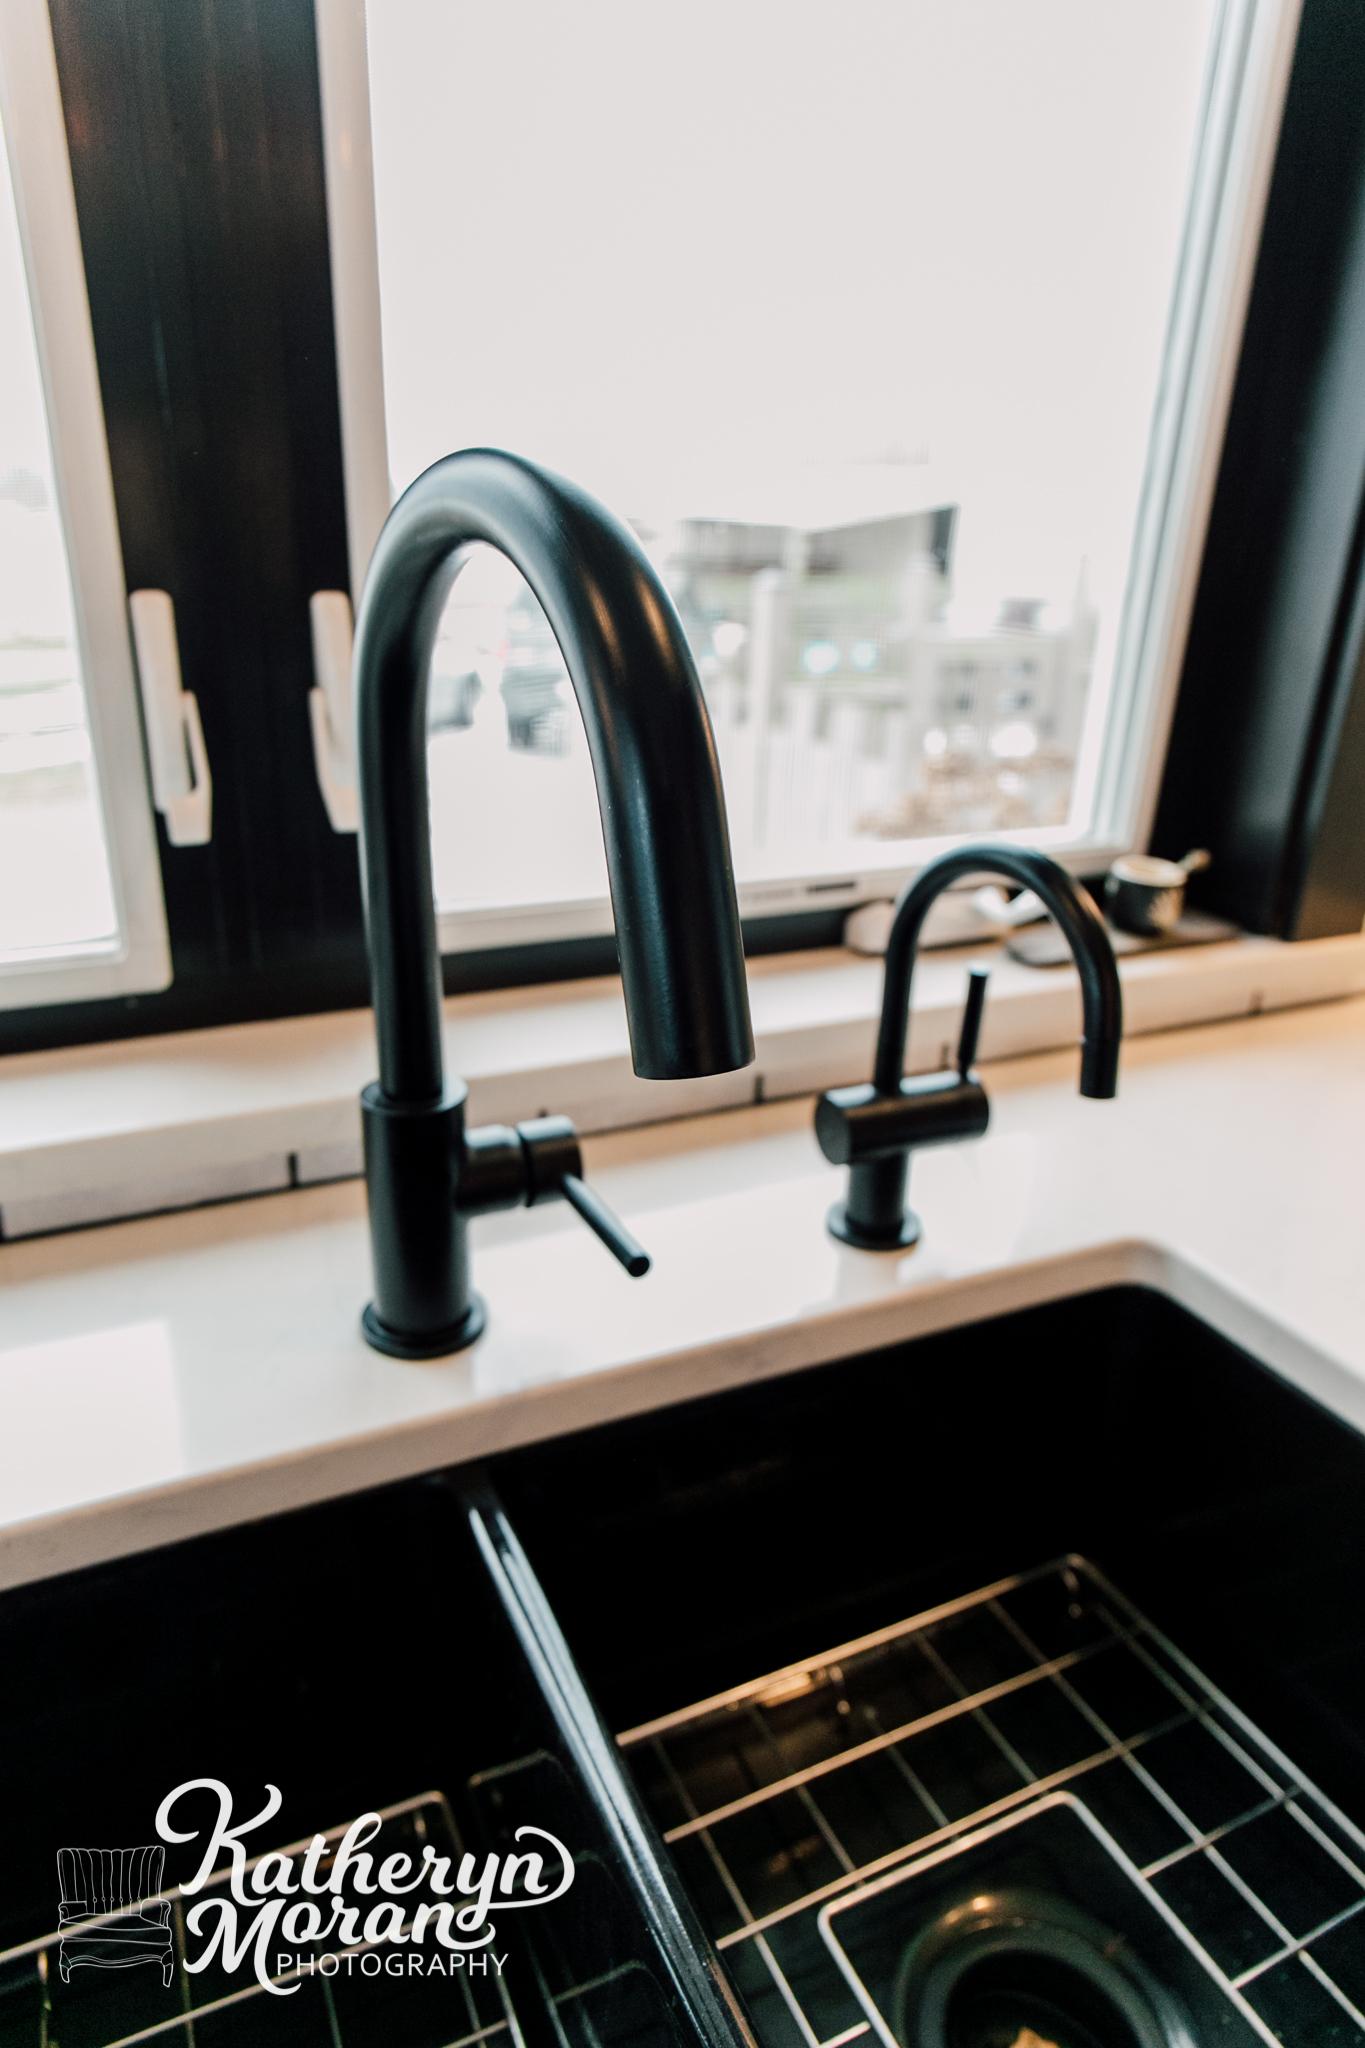 bellingham-photographer-katheryn-moran-jennifer-ryan-designs-interior-design-ferndale-kitchen-2019-1-3.jpg